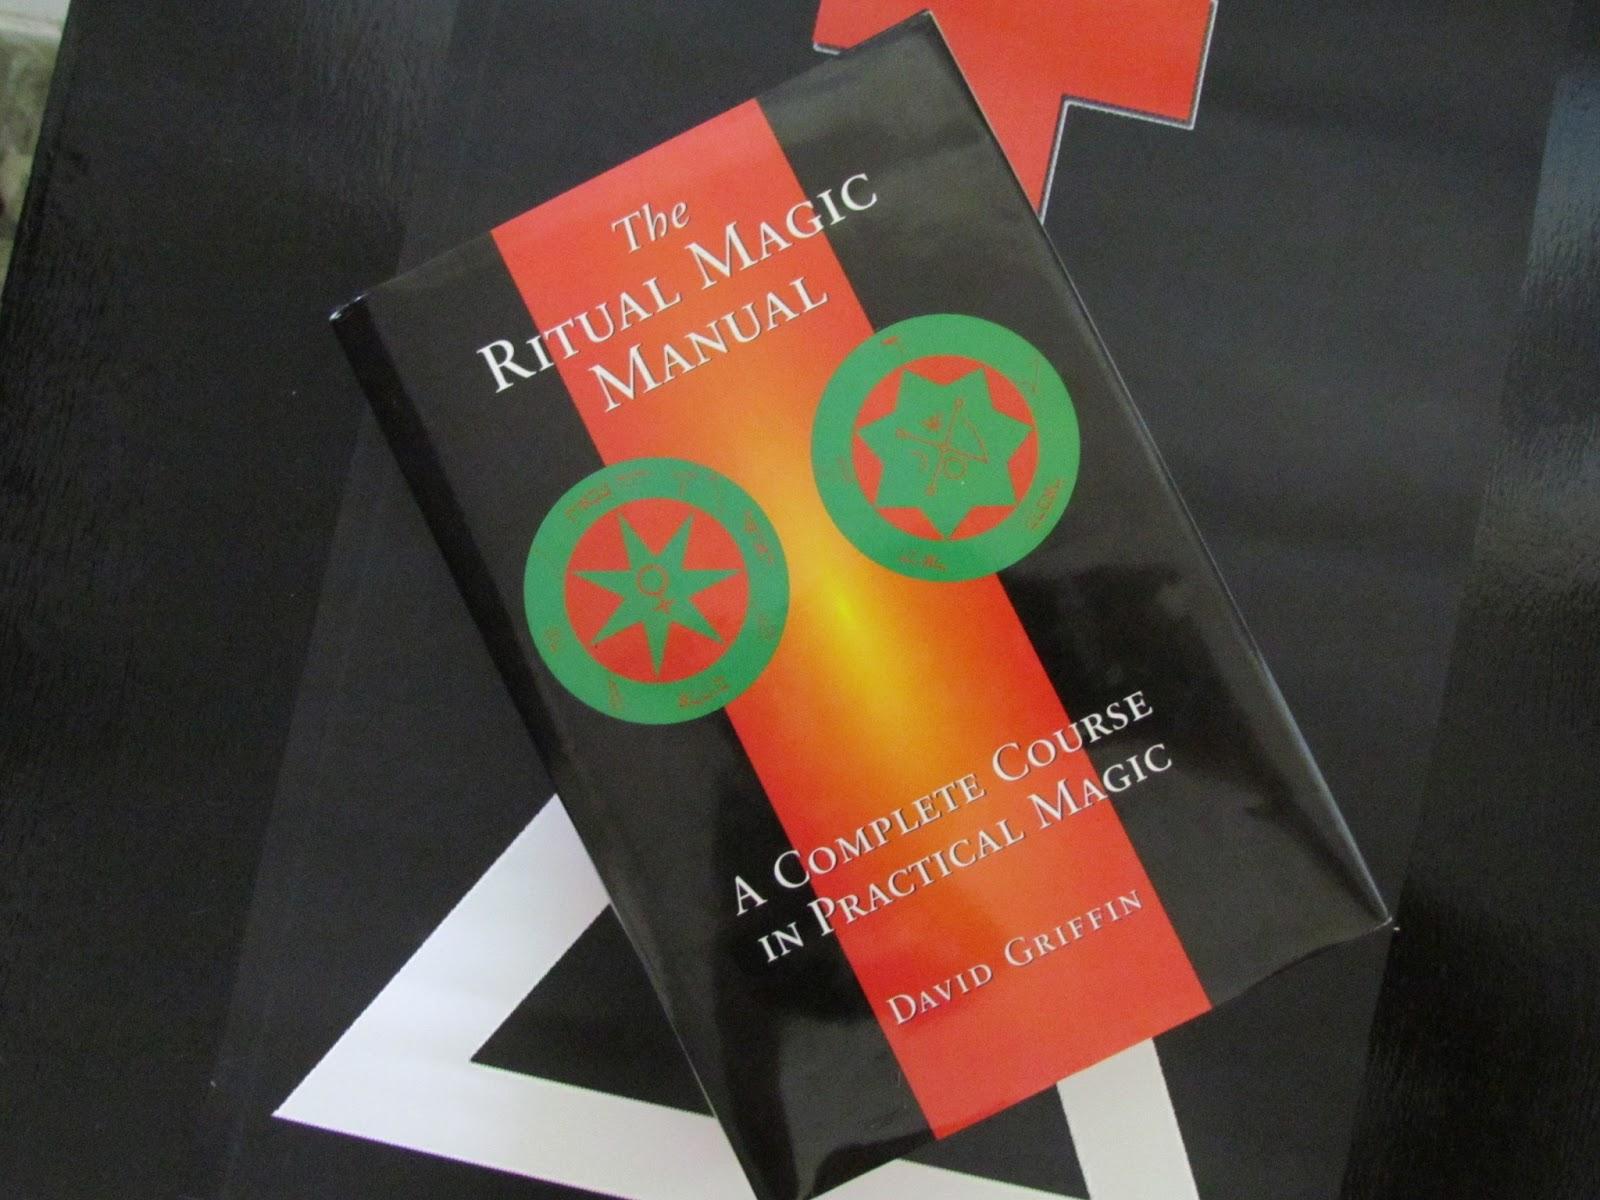 He recibido mi copia de The Ritual Magic Manual: A Complete Course in  Practical Magic (El Manual de Magia Ritual: Un Curso Completo de Magia  Práctica) ...